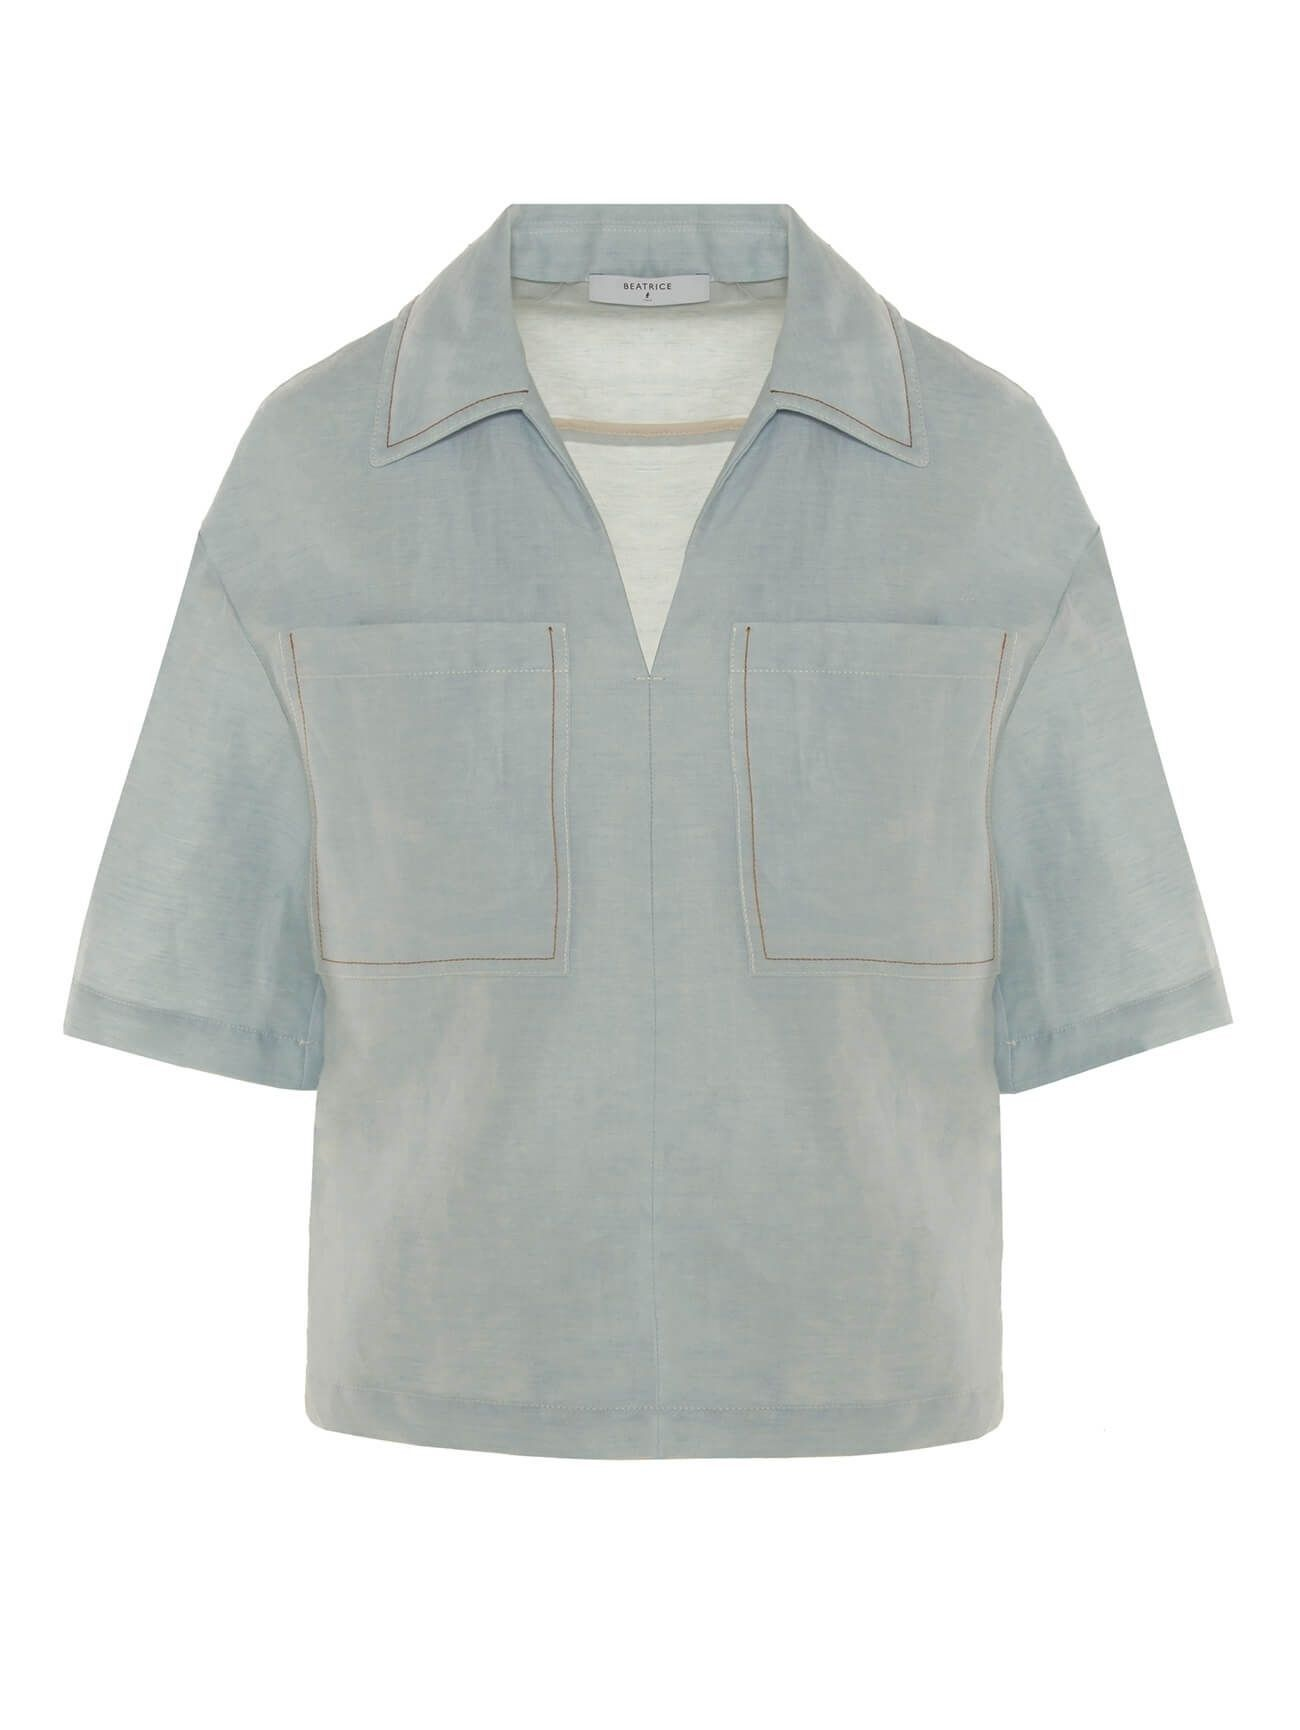 BEATRICE.B - Damen Hemd - Camicia Tessuto - Azzurro